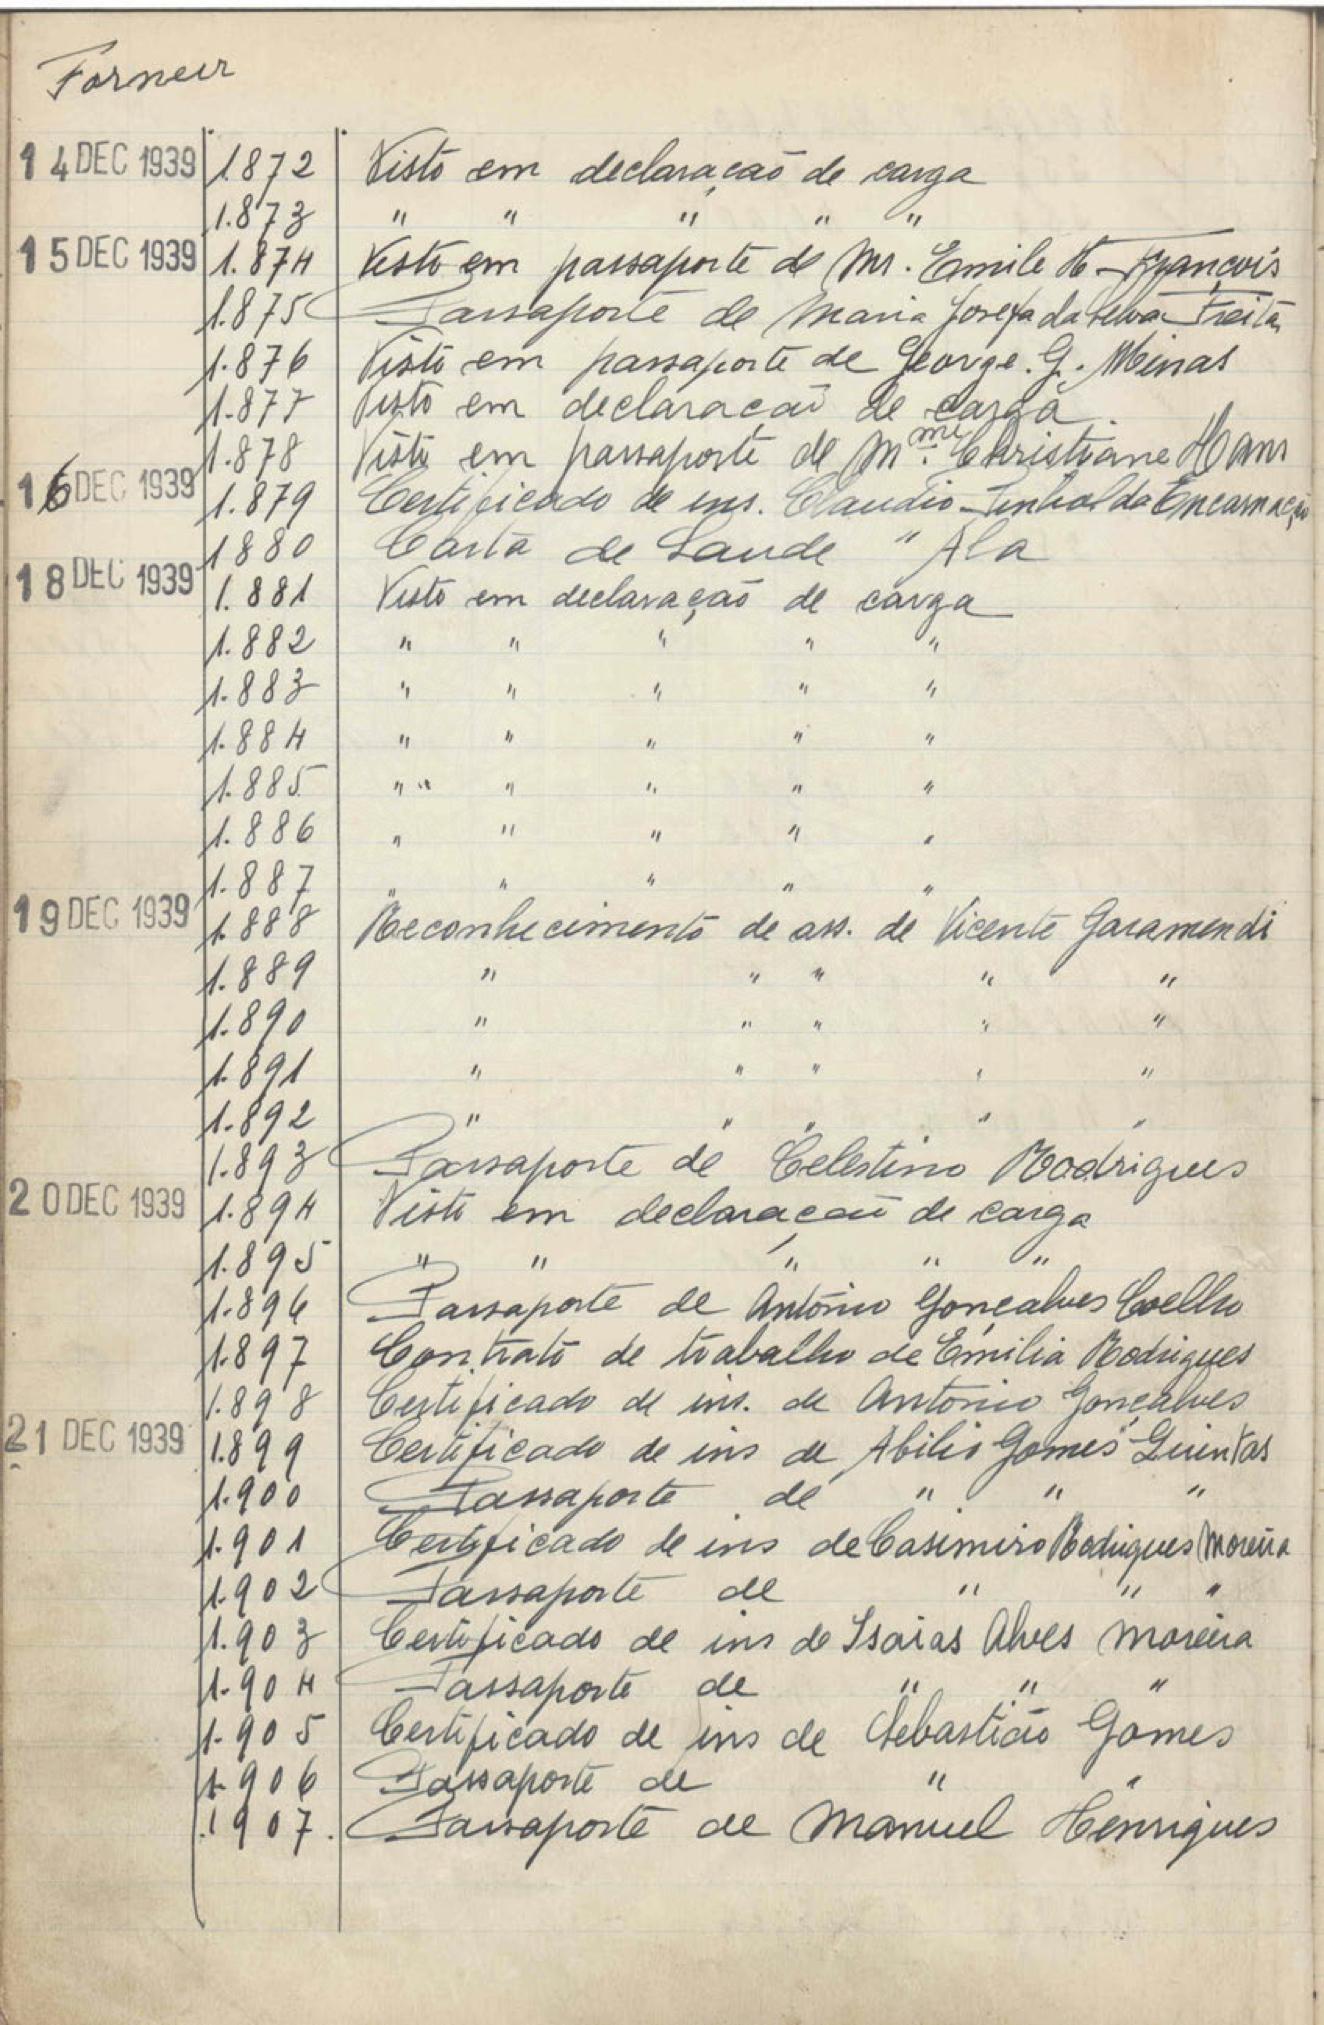 1872-1907